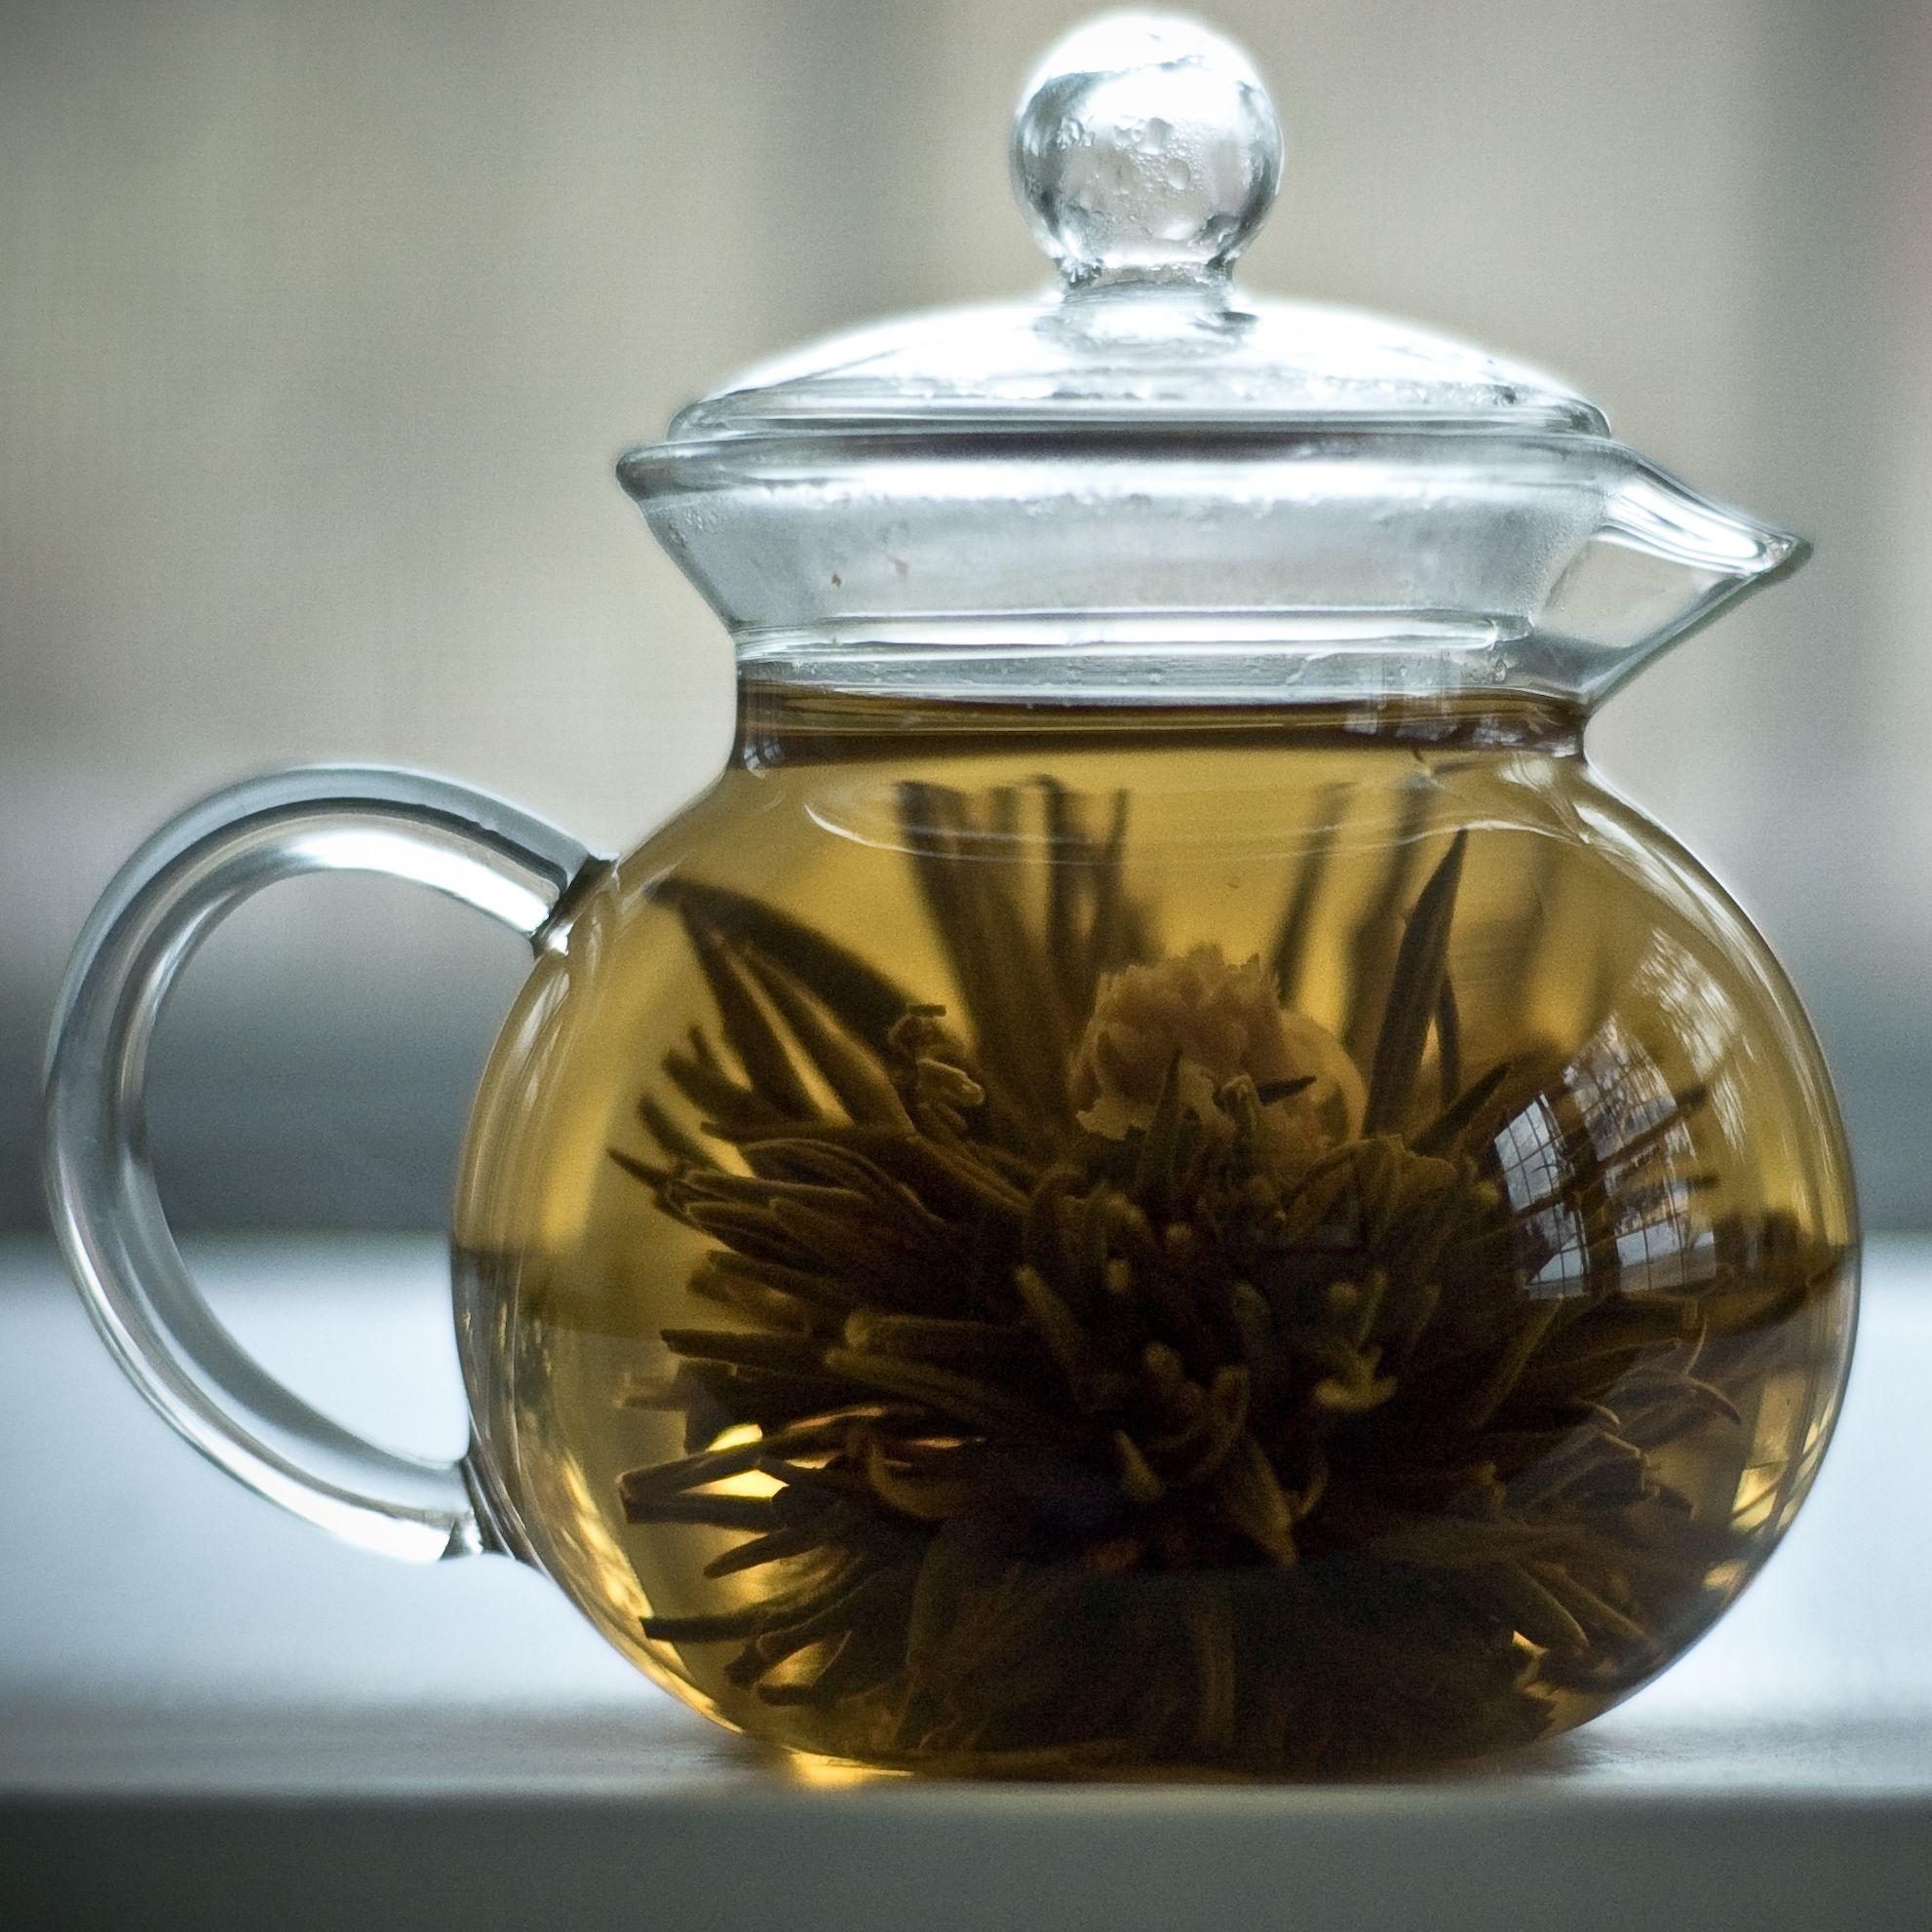 Chinese herbal insomnia tea - 10 Herbal Teas That Help You Relax